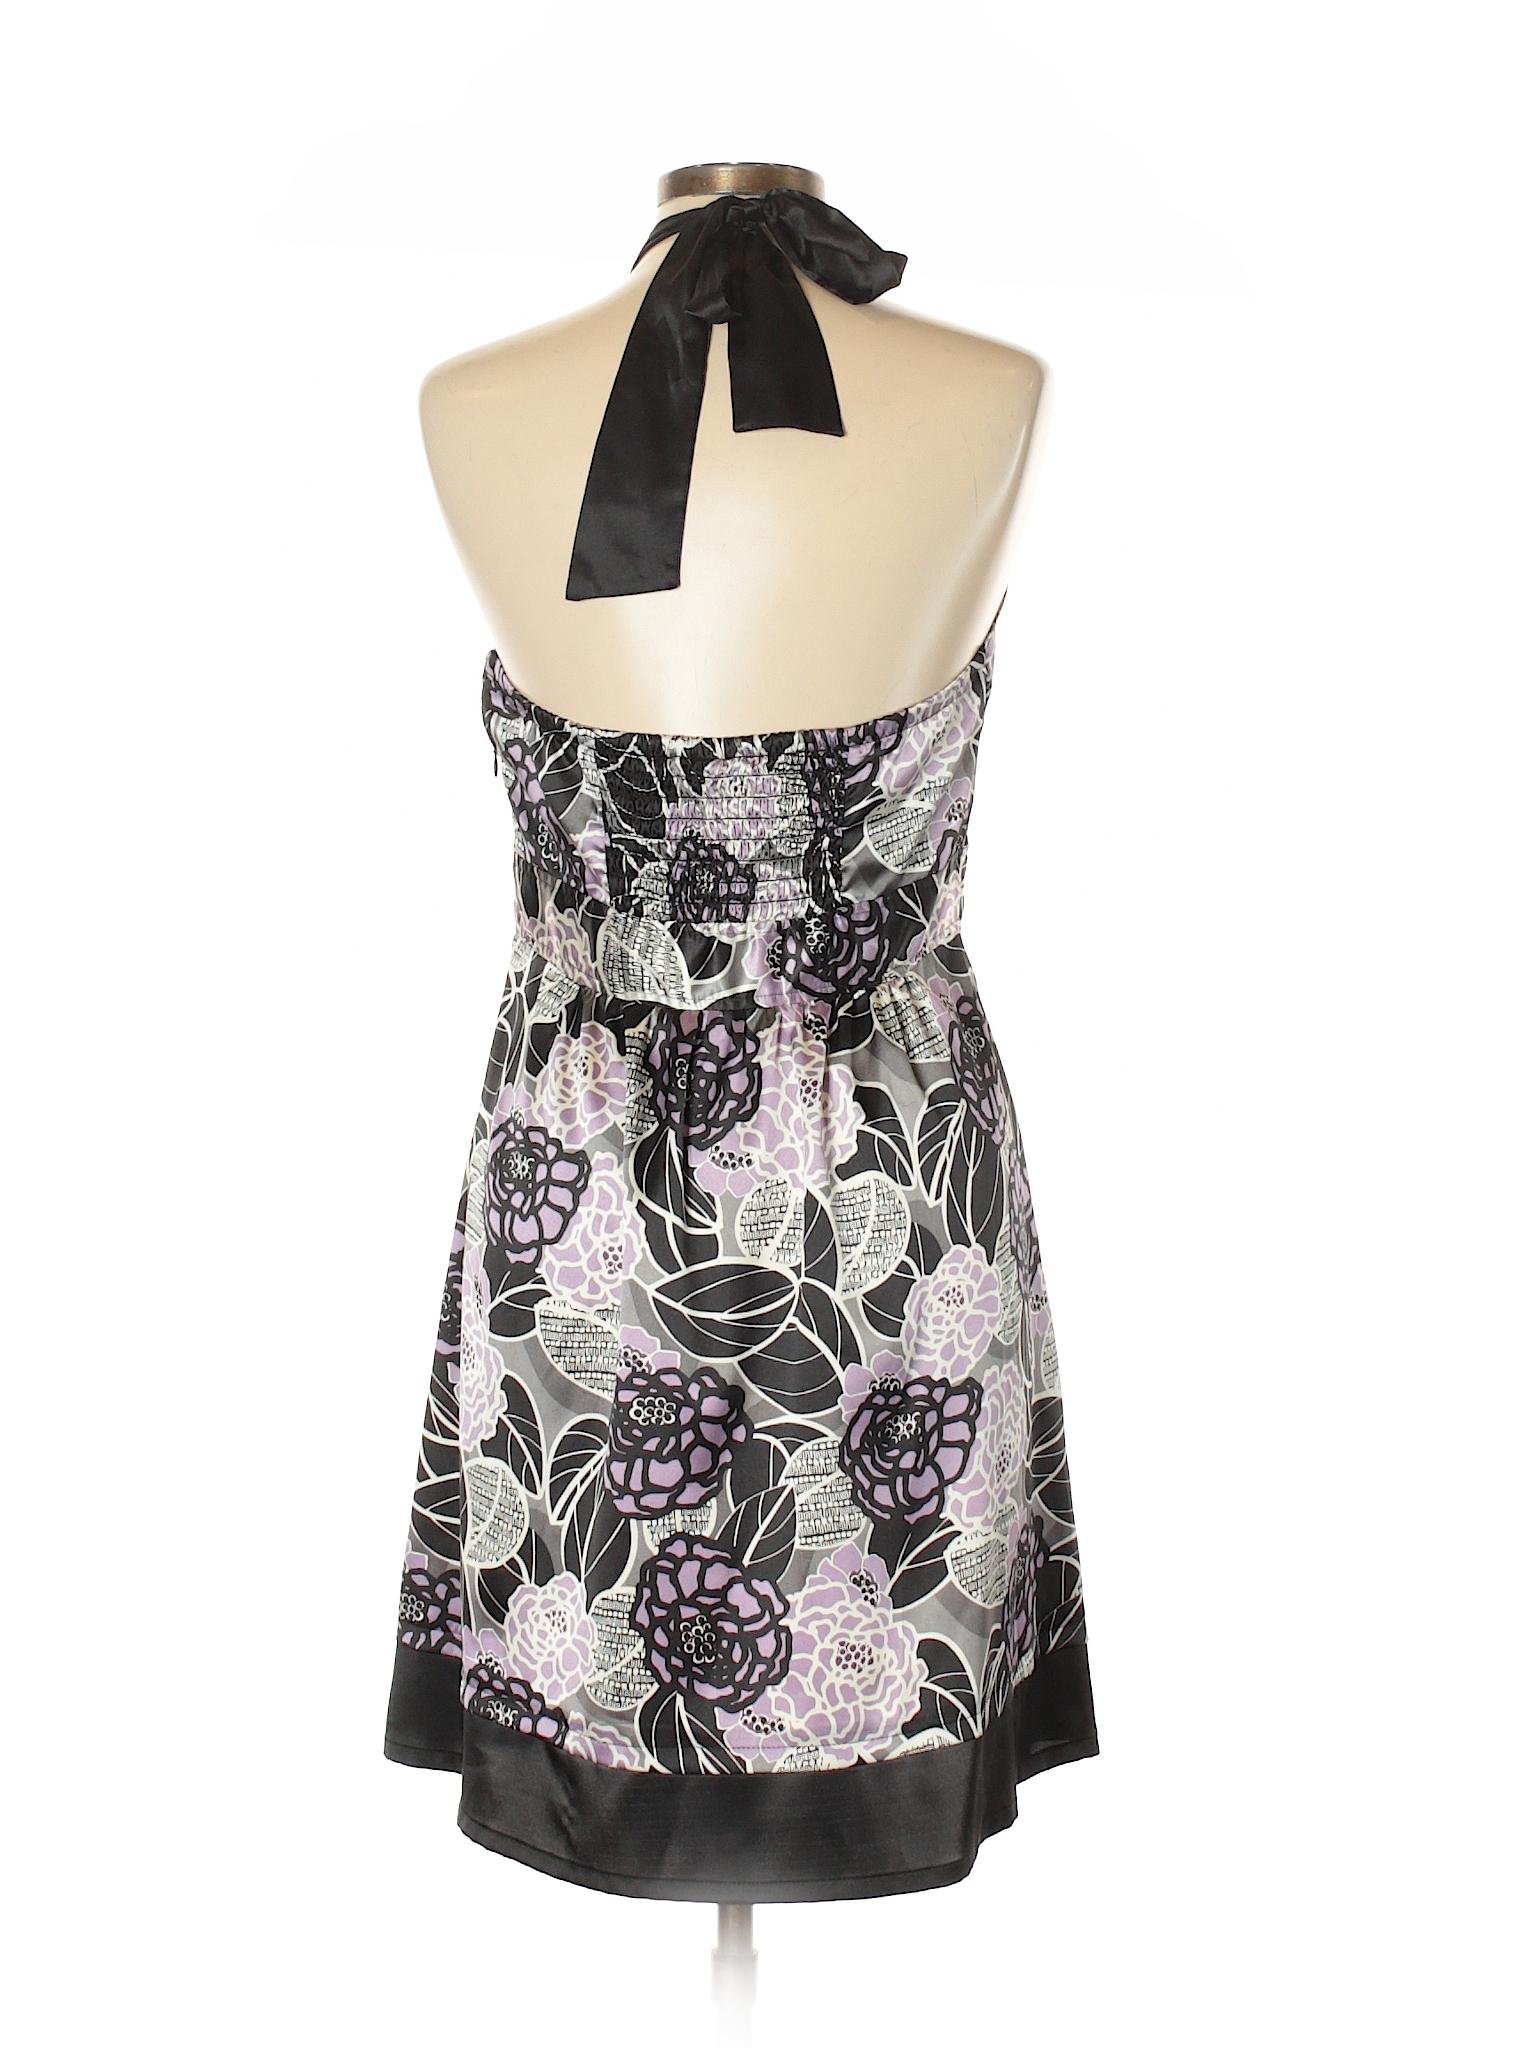 Dress Casual Apt winter Boutique 9 w4ZSqf